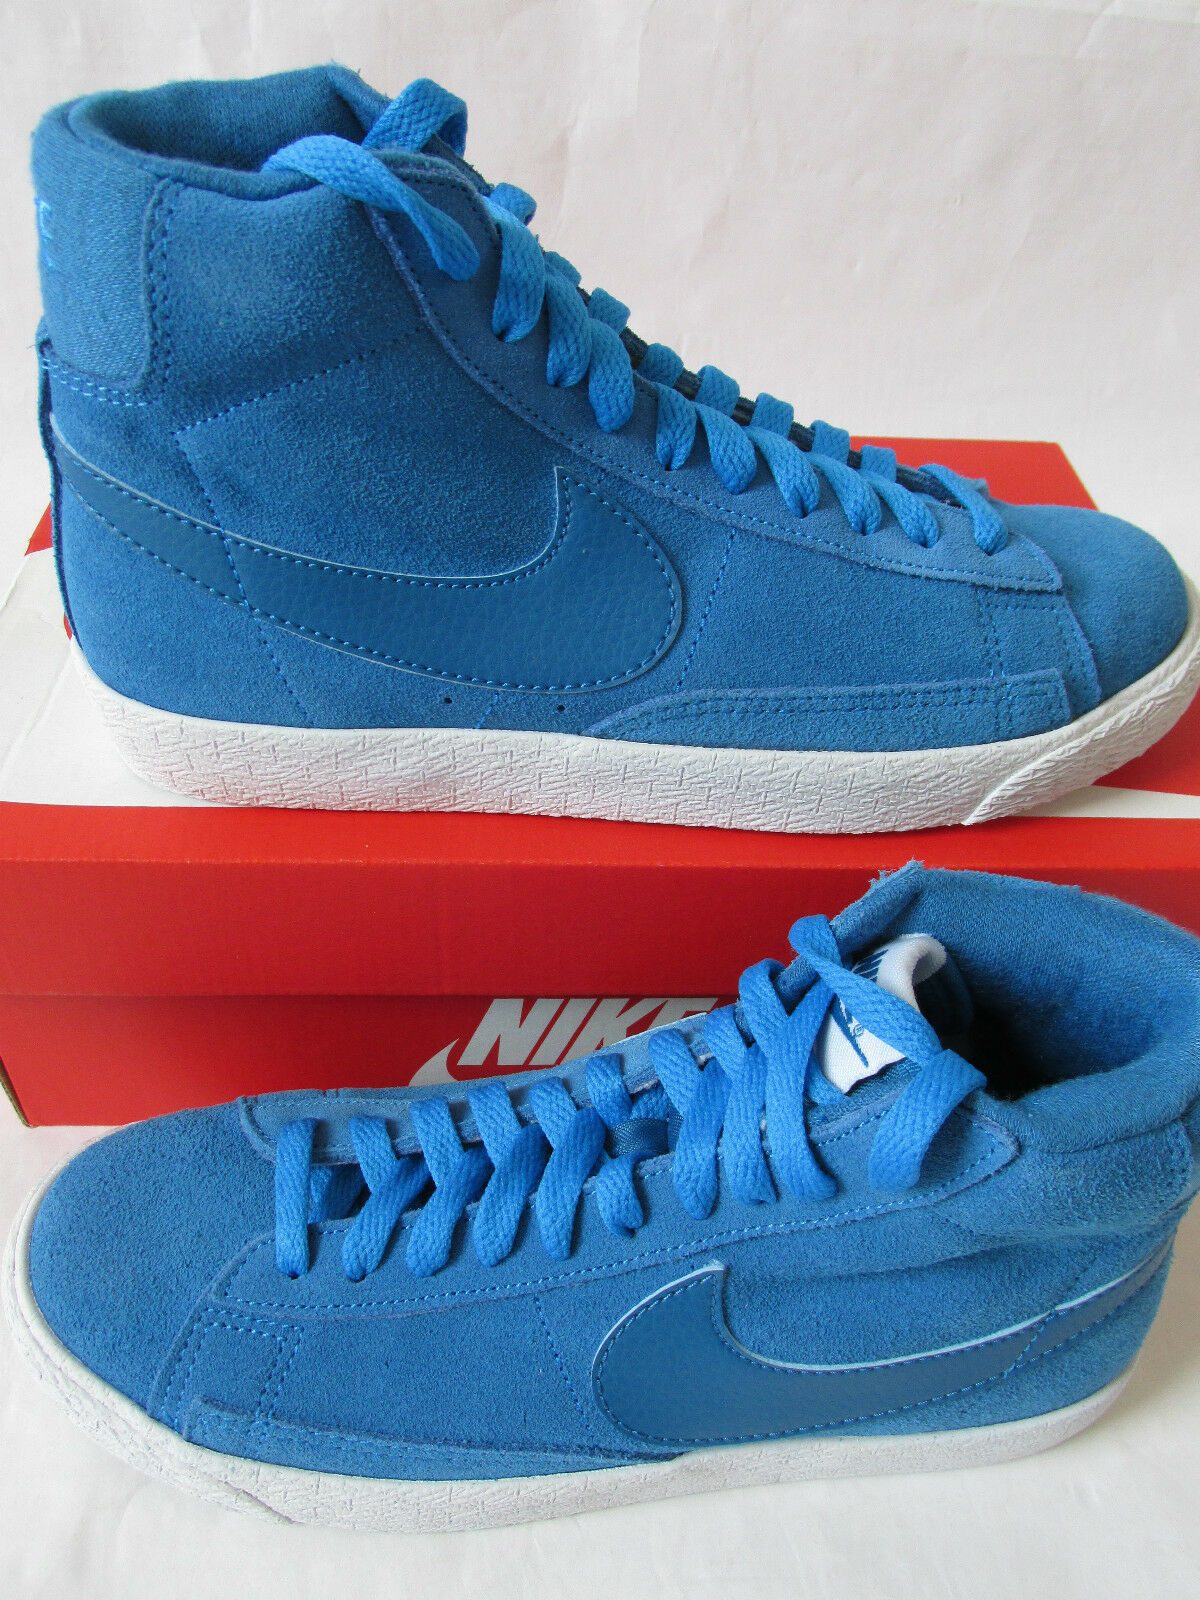 Nike blazer mid top vintage (GS) hi top mid trainers 539929 441 Turnschuhe schuhe 779689